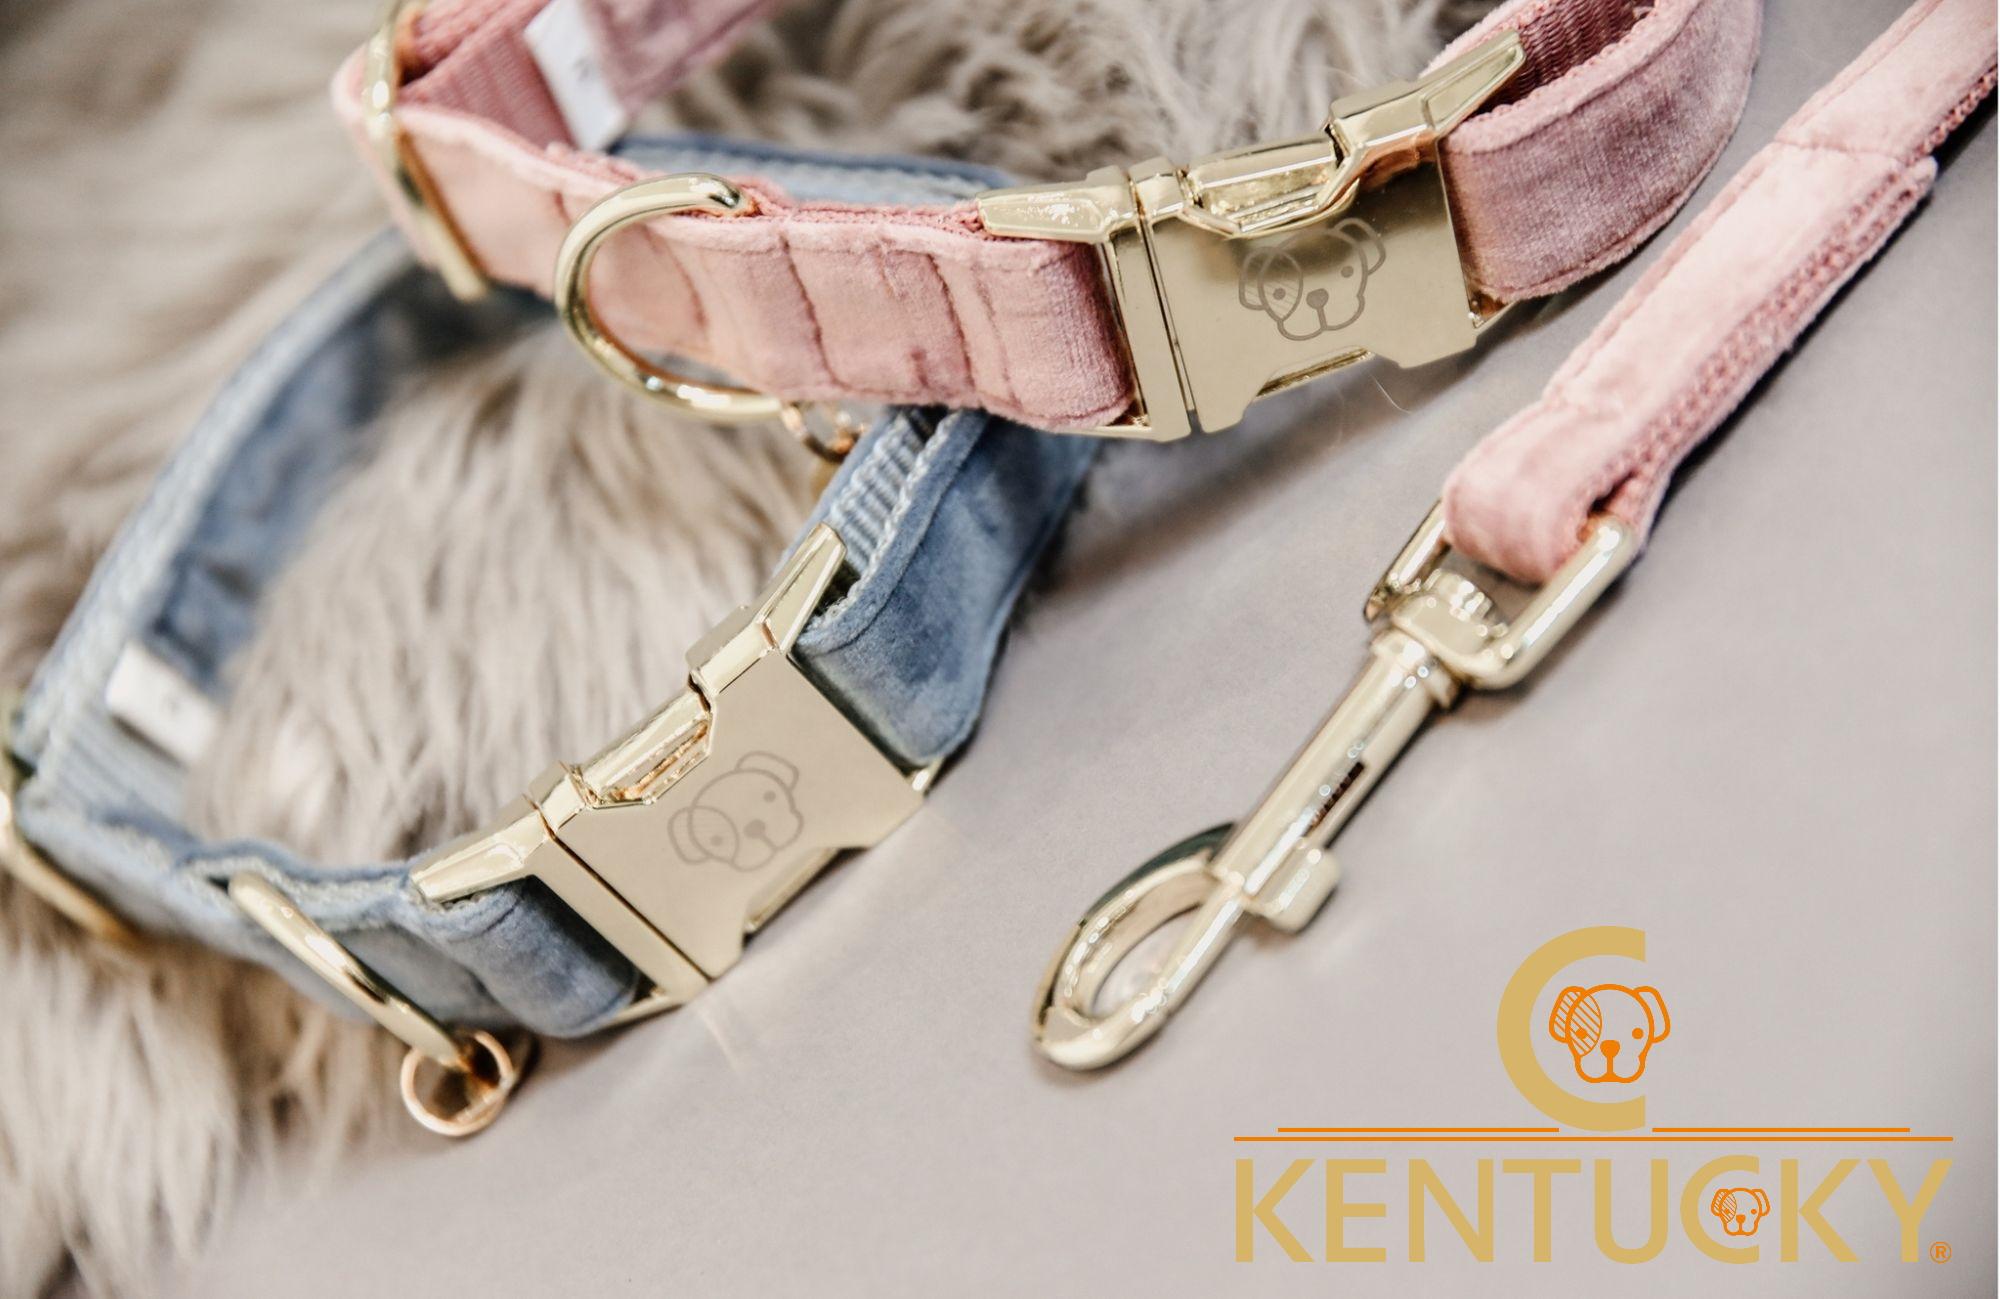 Kentucky Dogwear - Equestra